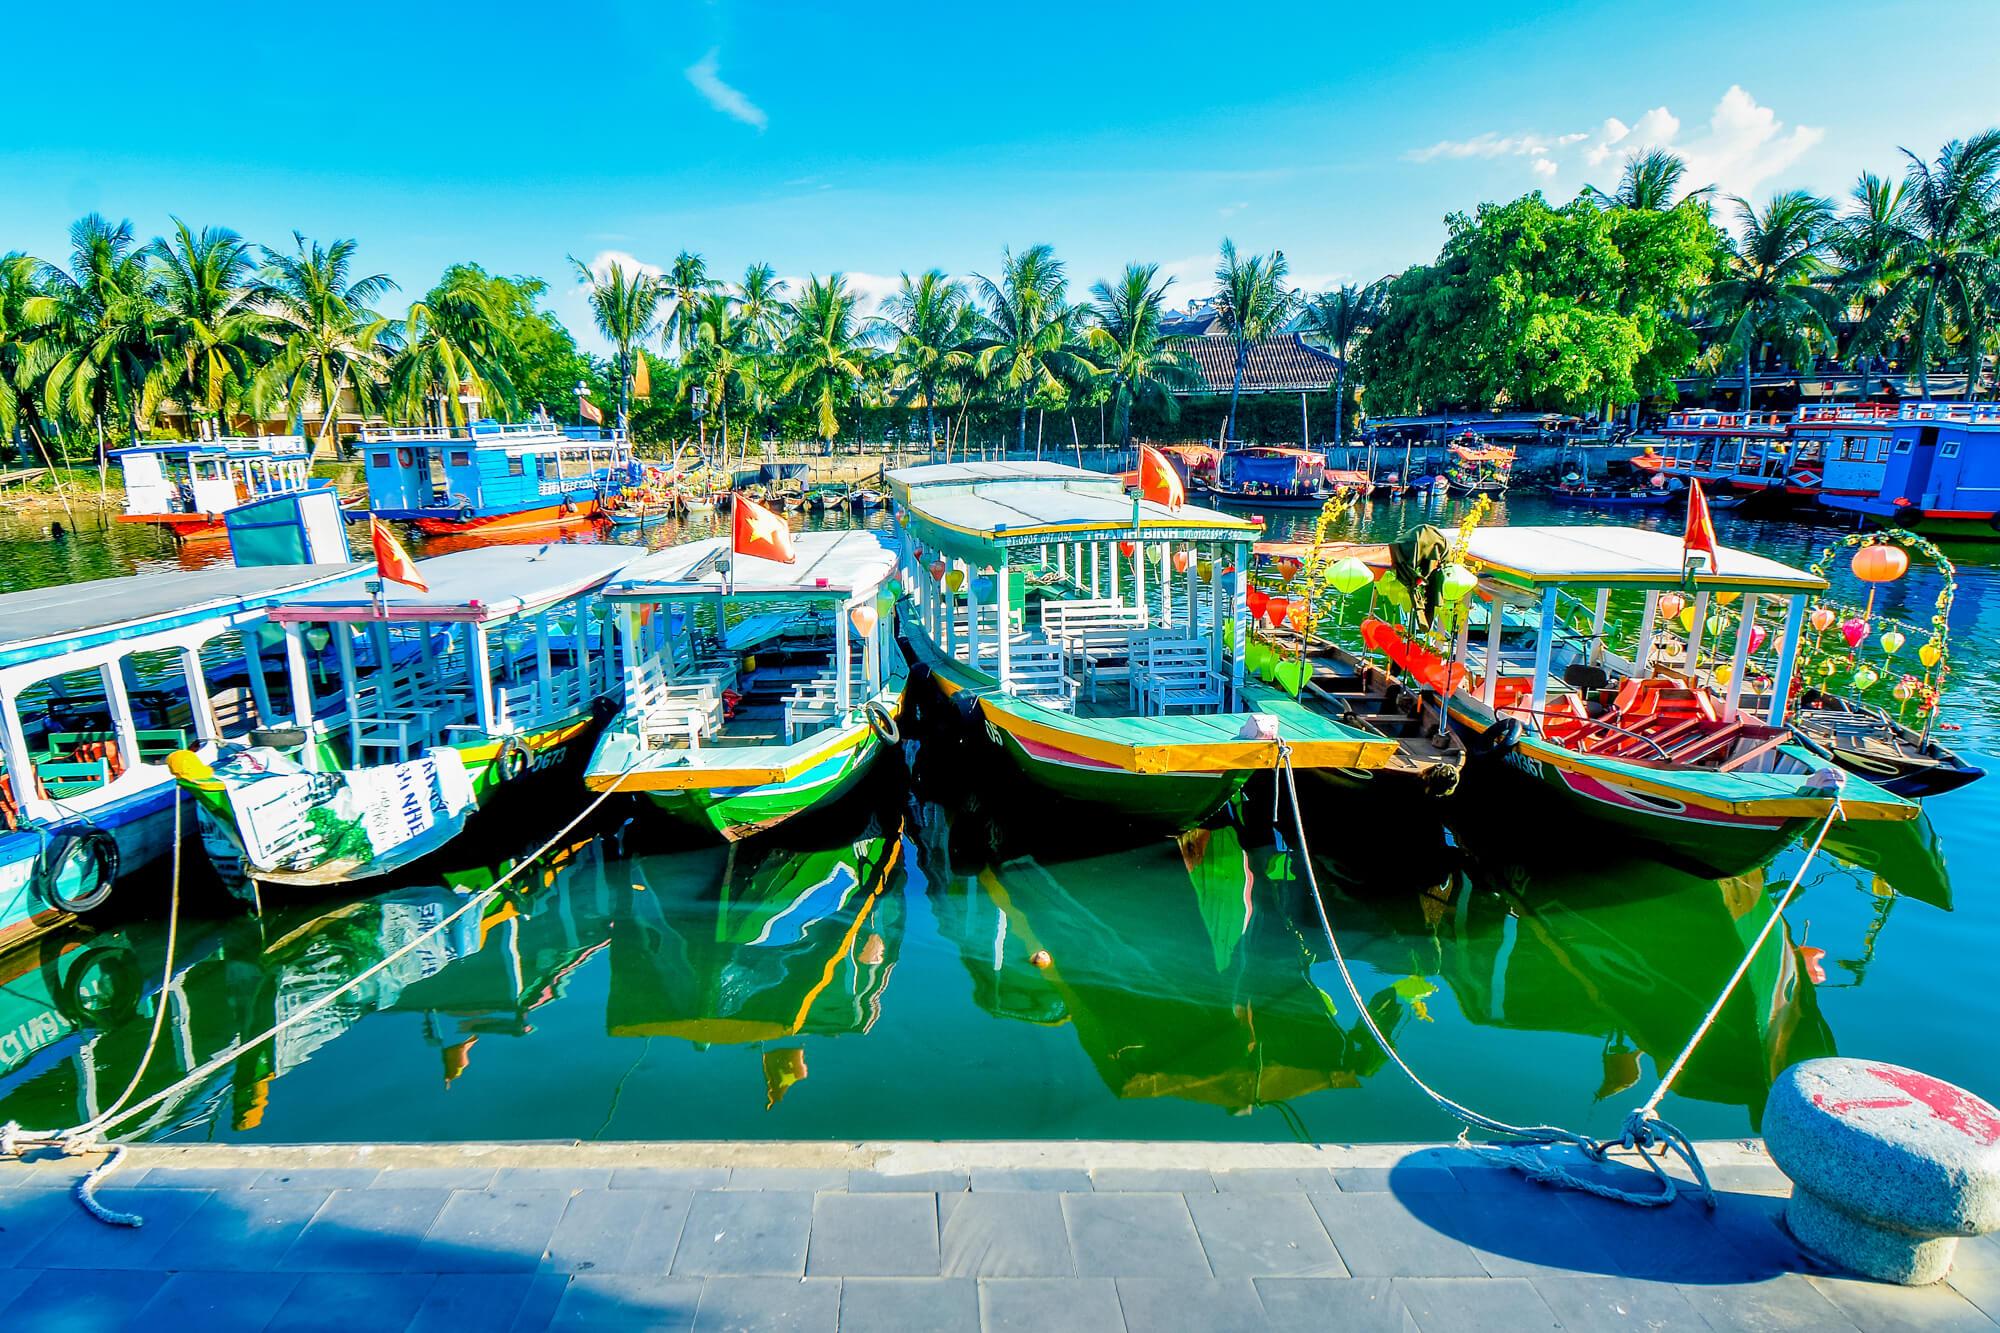 Thu Bon River Boat Dock